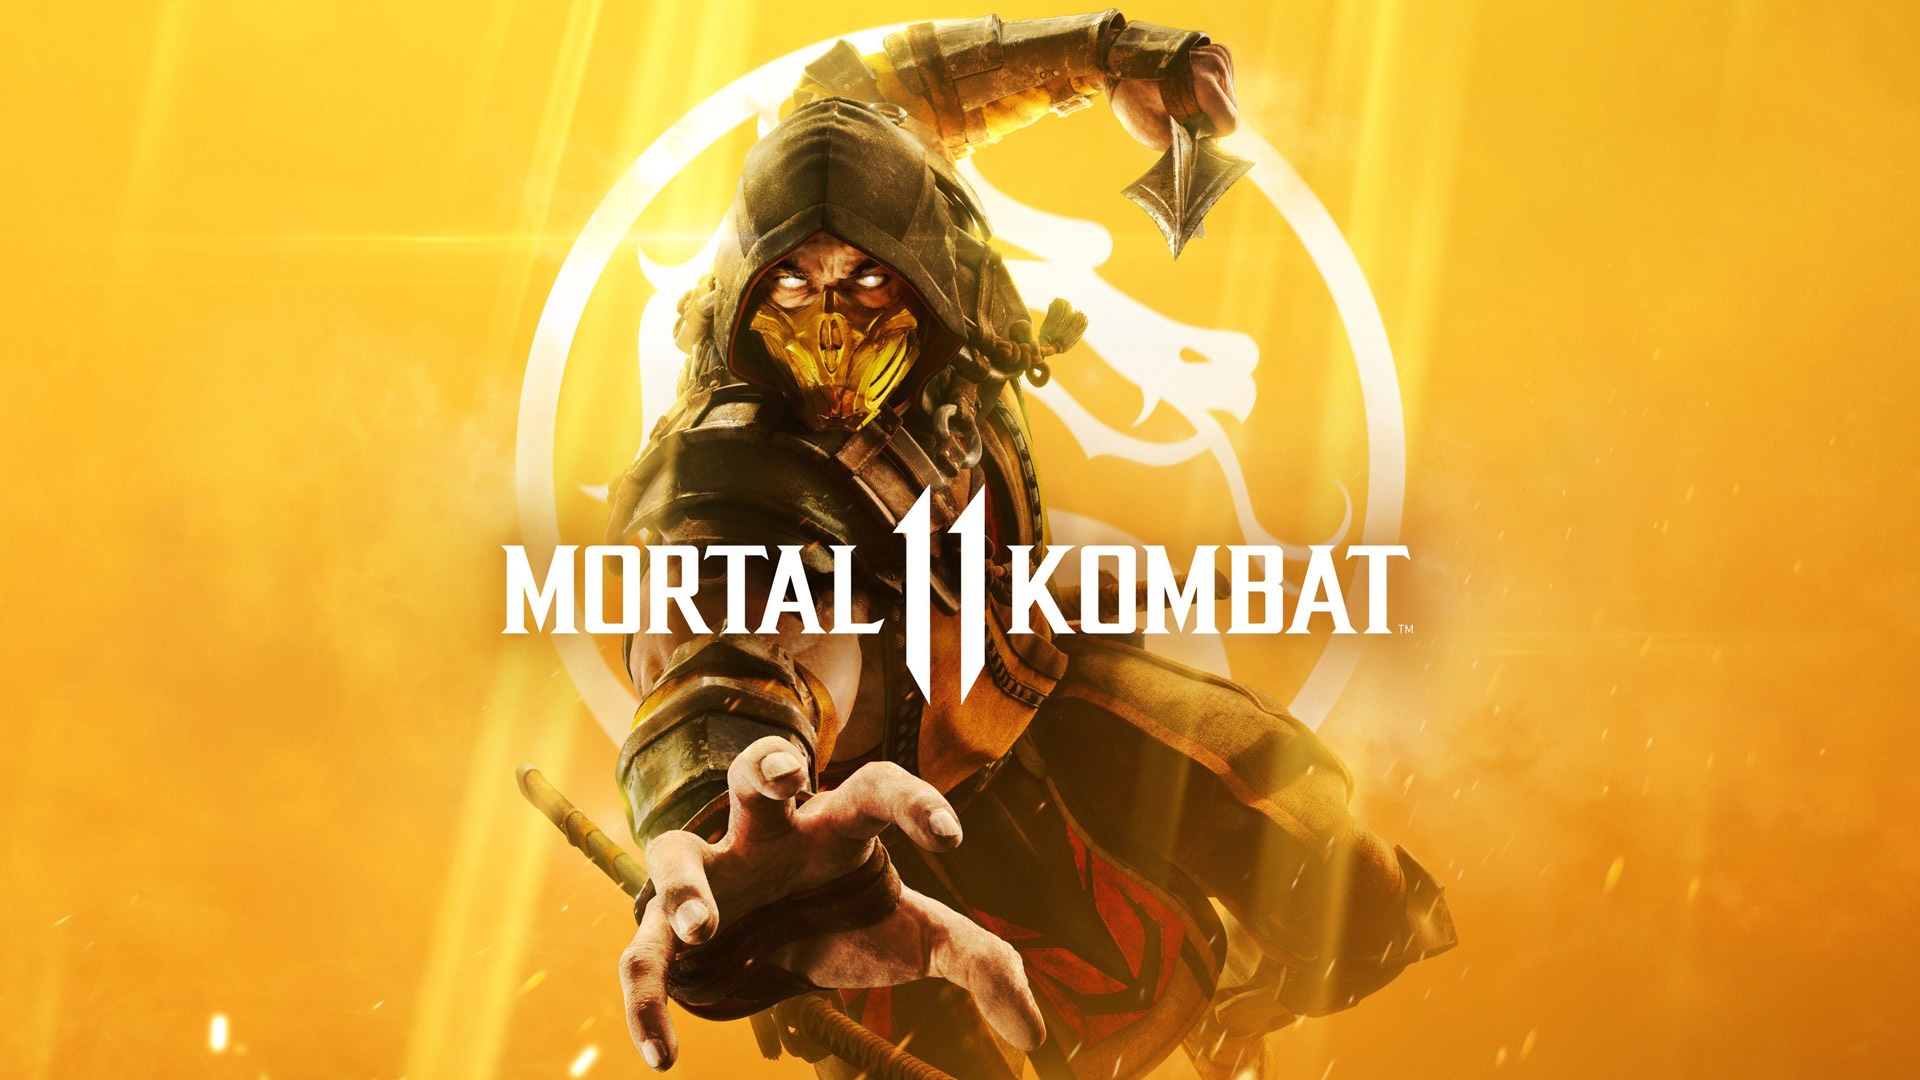 Free Mortal Kombat 11 Wallpaper in 1920x1080